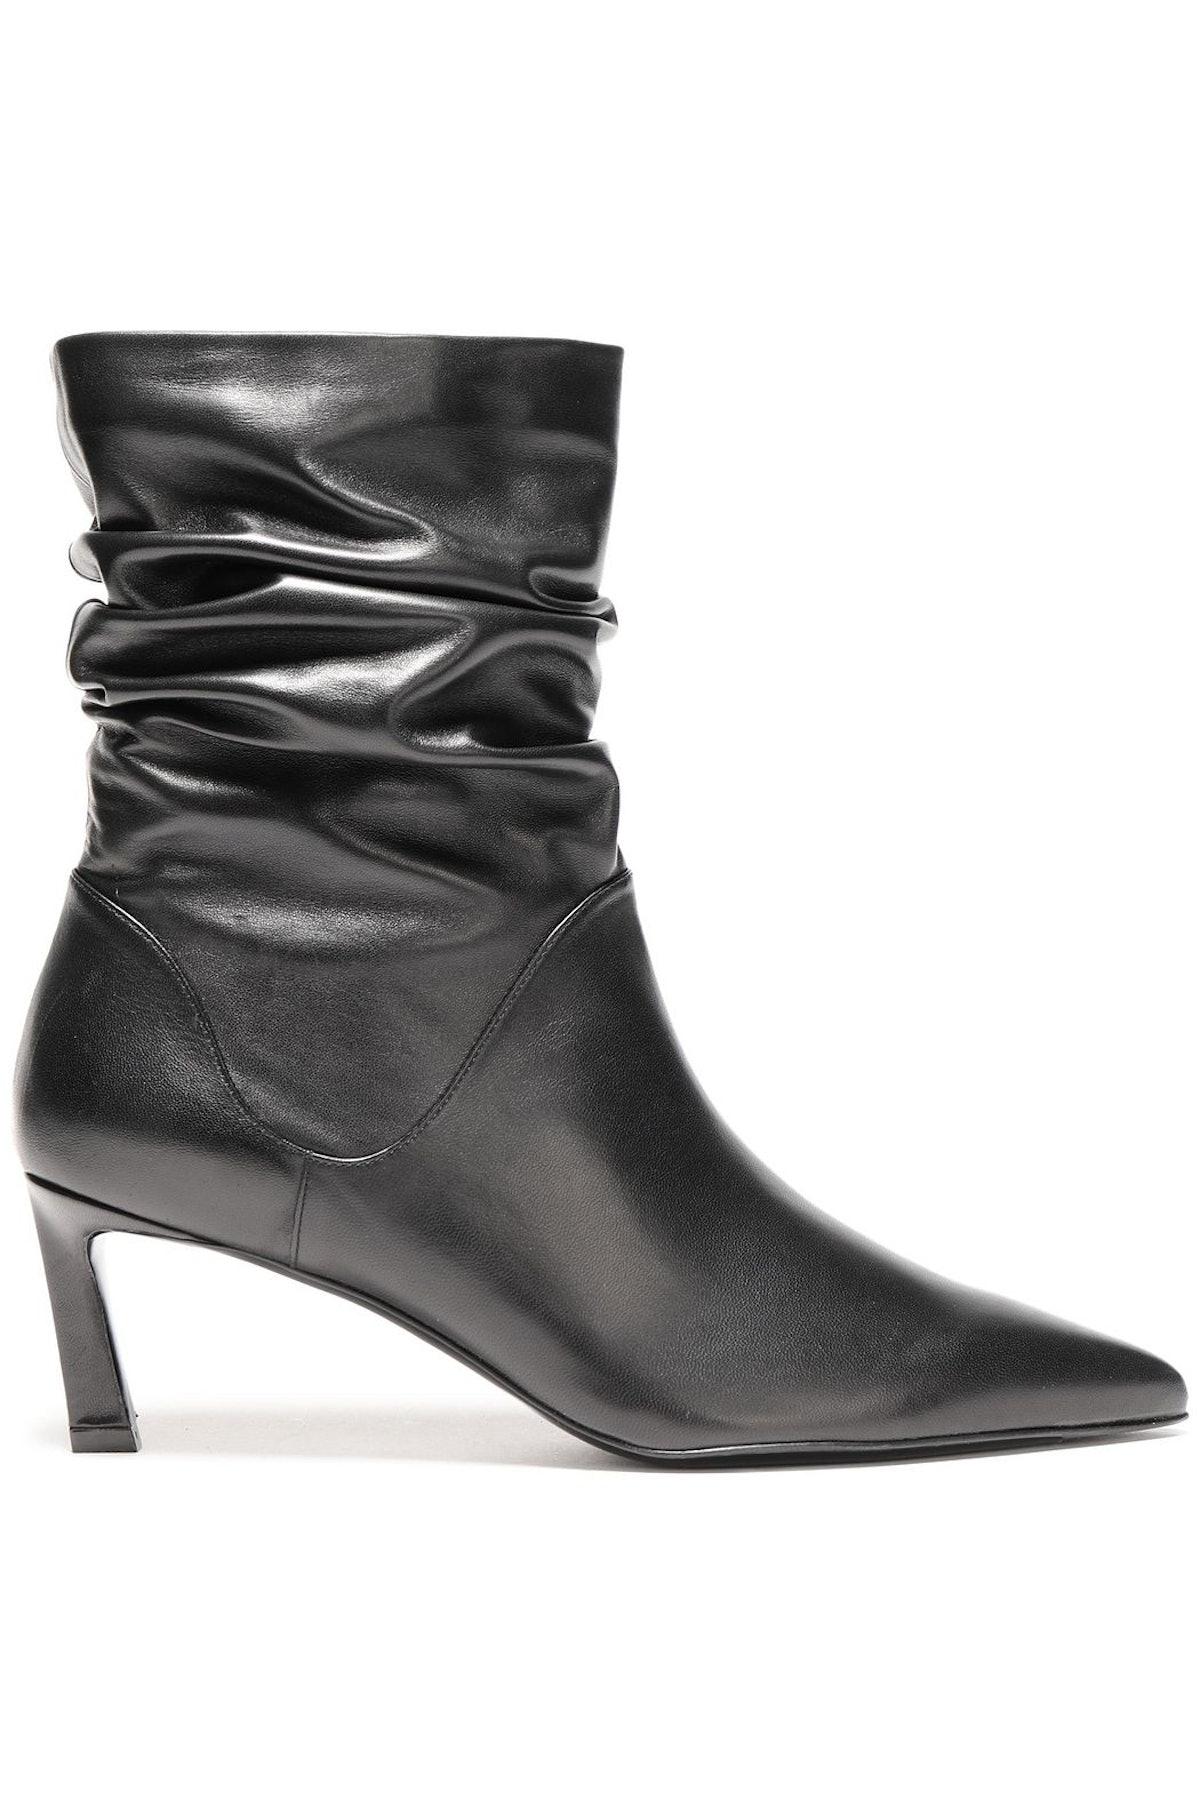 Stuart Weitzman Demi Gathered Leather Ankle Boots